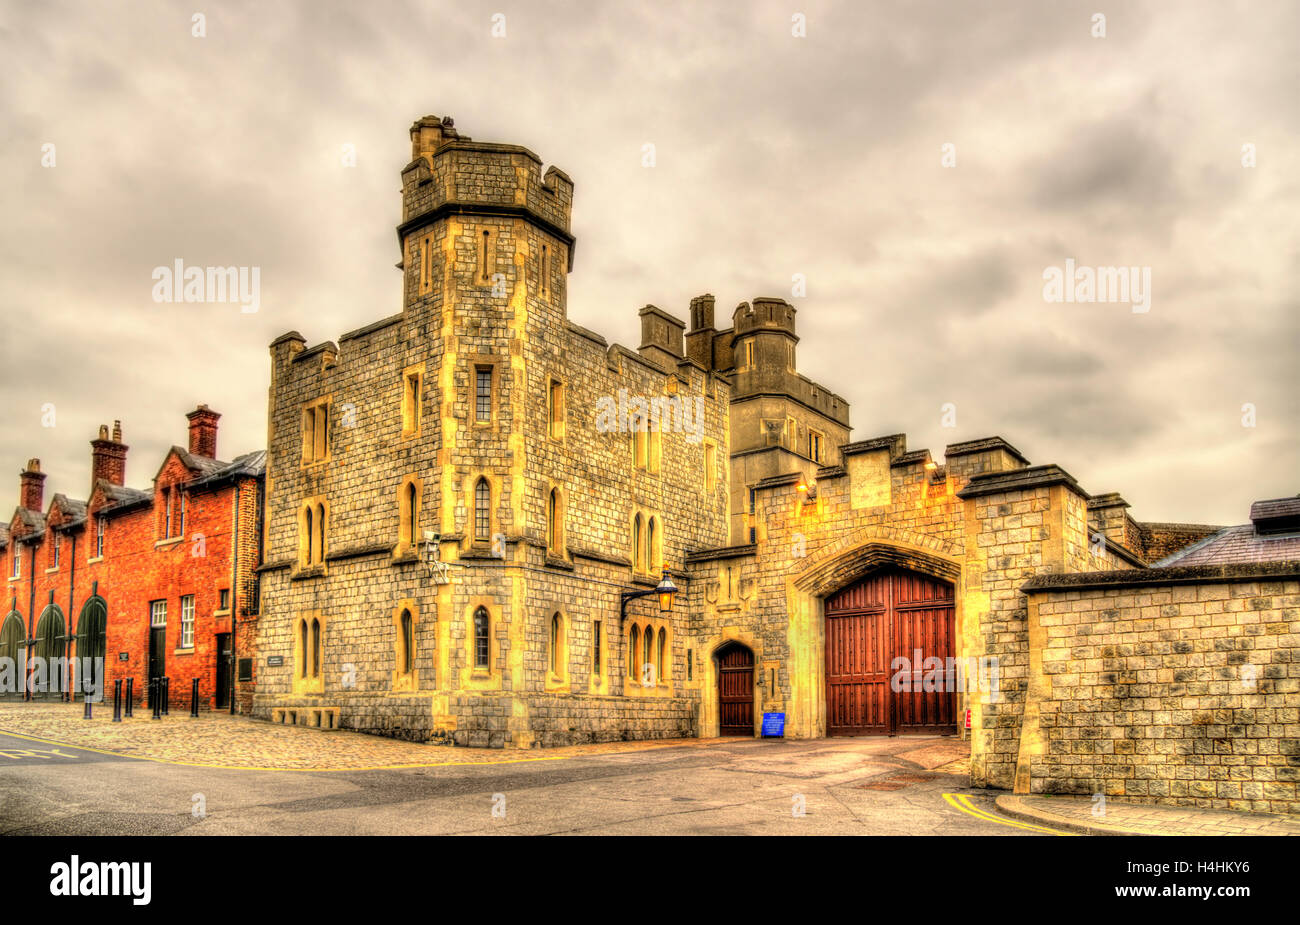 Tor von Schloss Windsor - England, Großbritannien Stockbild